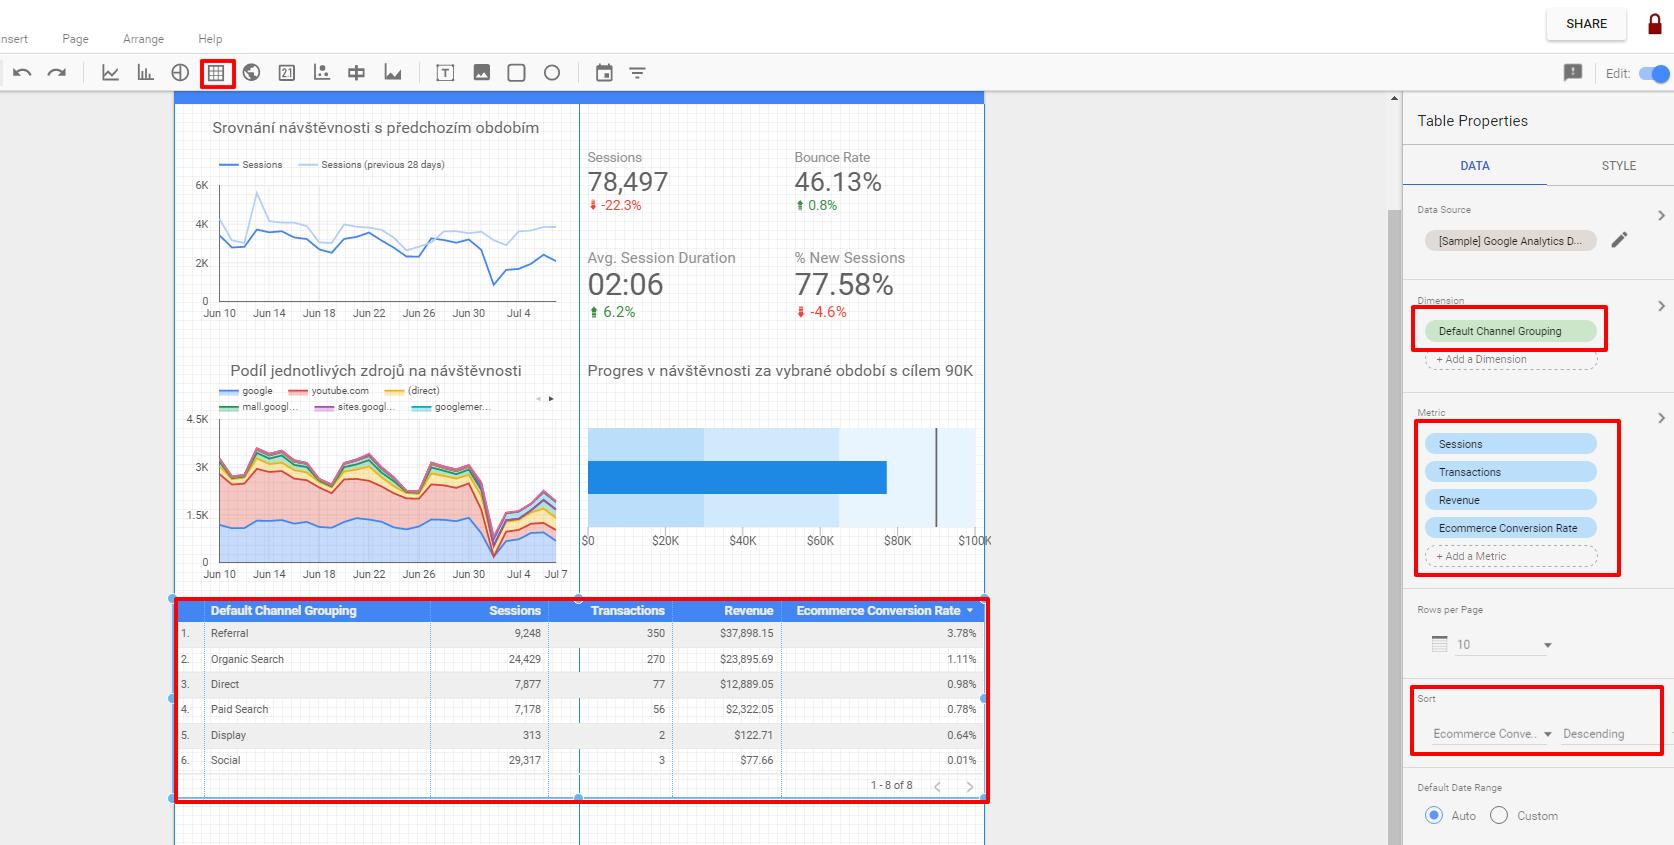 Google Data Studio - Table